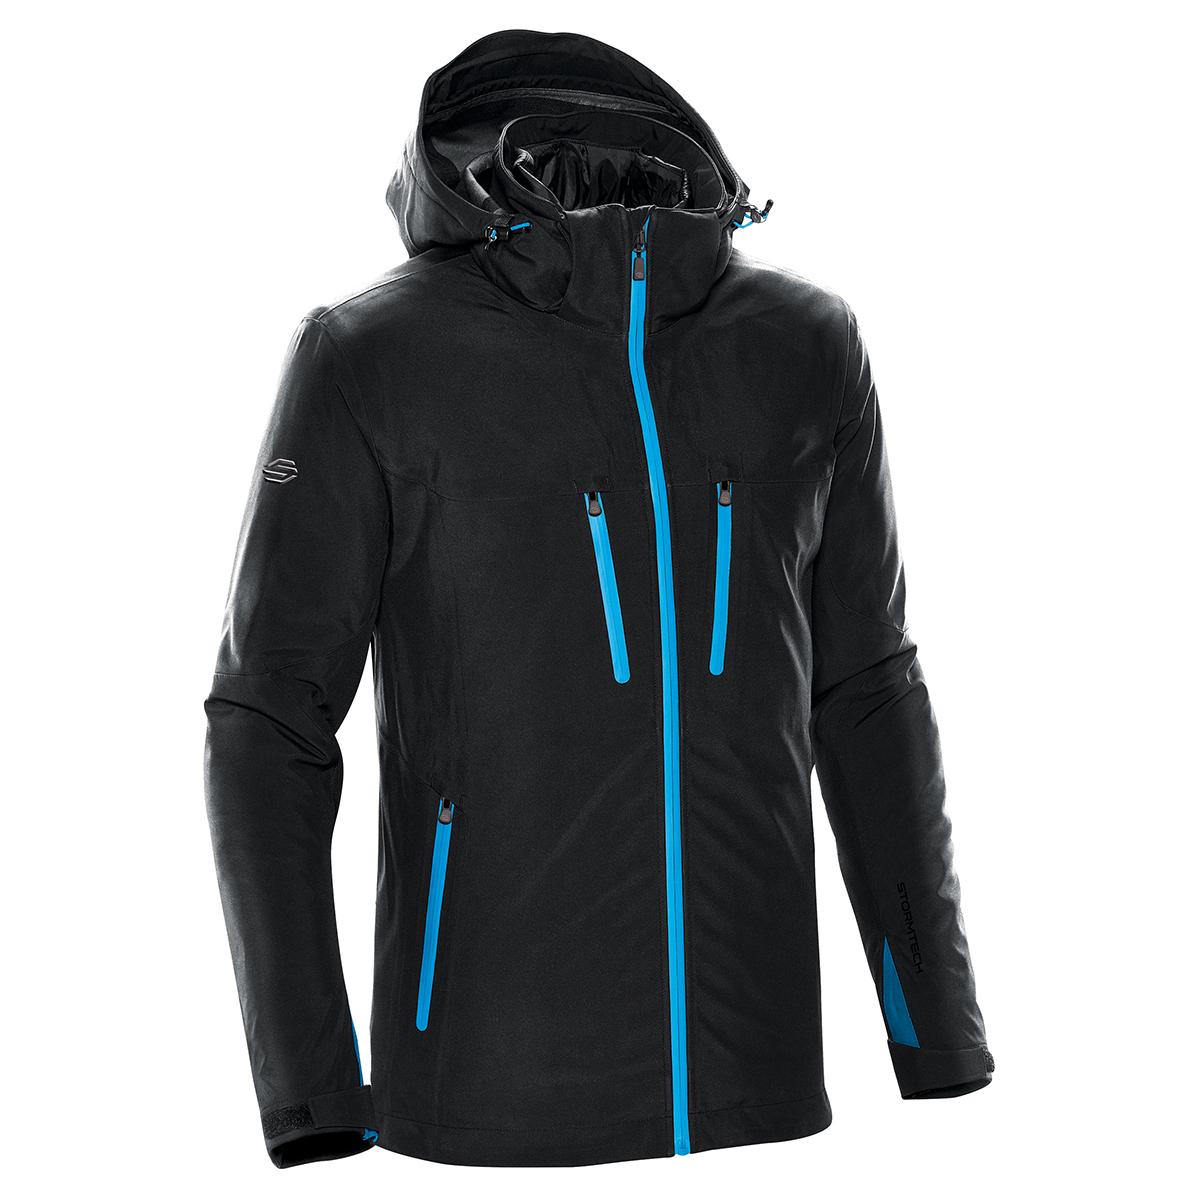 Stormtech Mens Matrix System Jacket (M) (Black/Electric Blue)